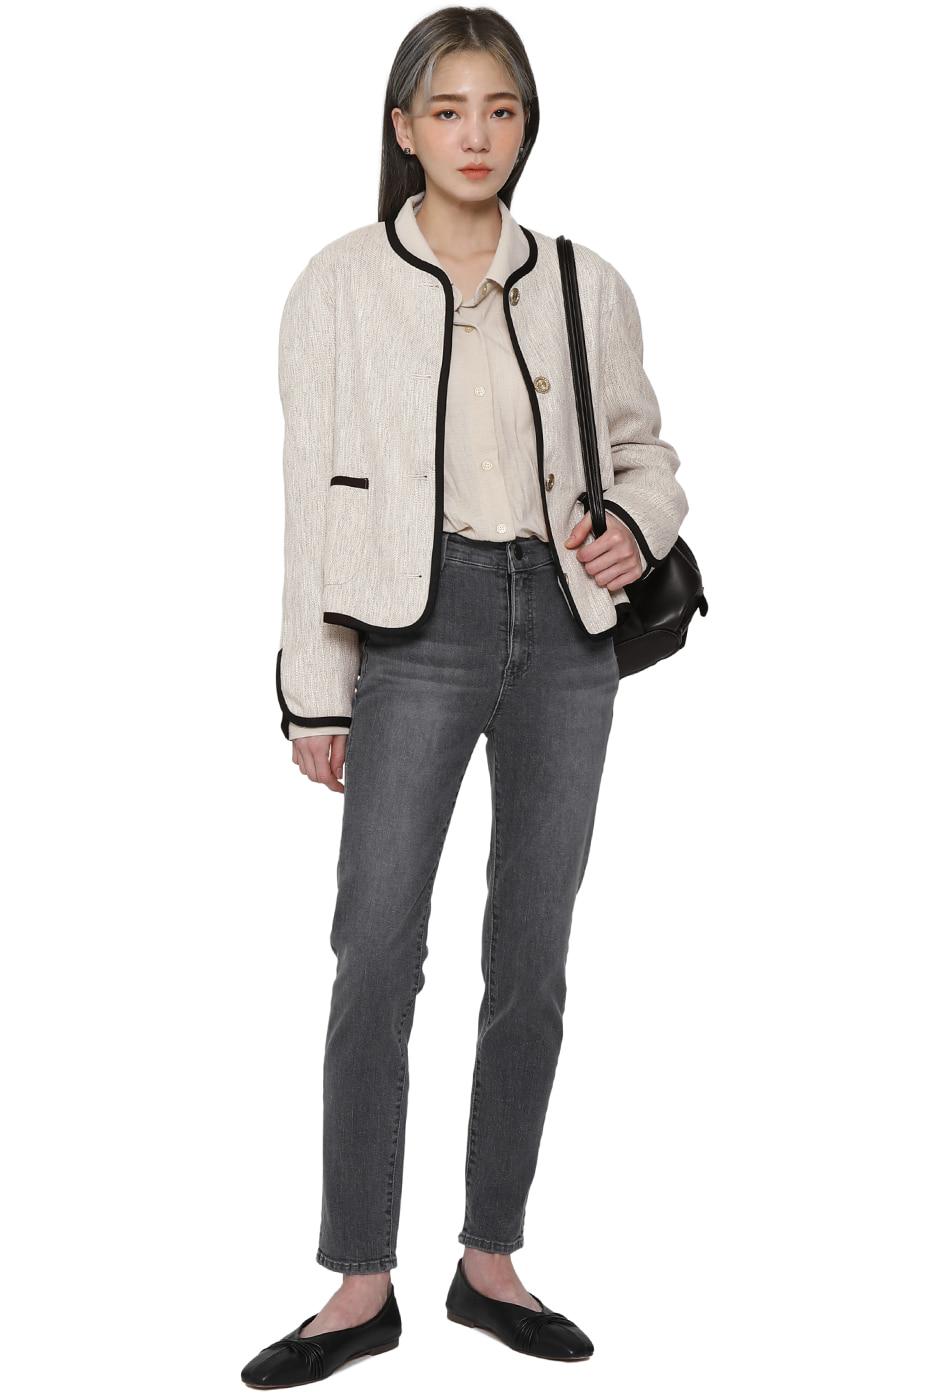 Manny Gray Skinny Jeans